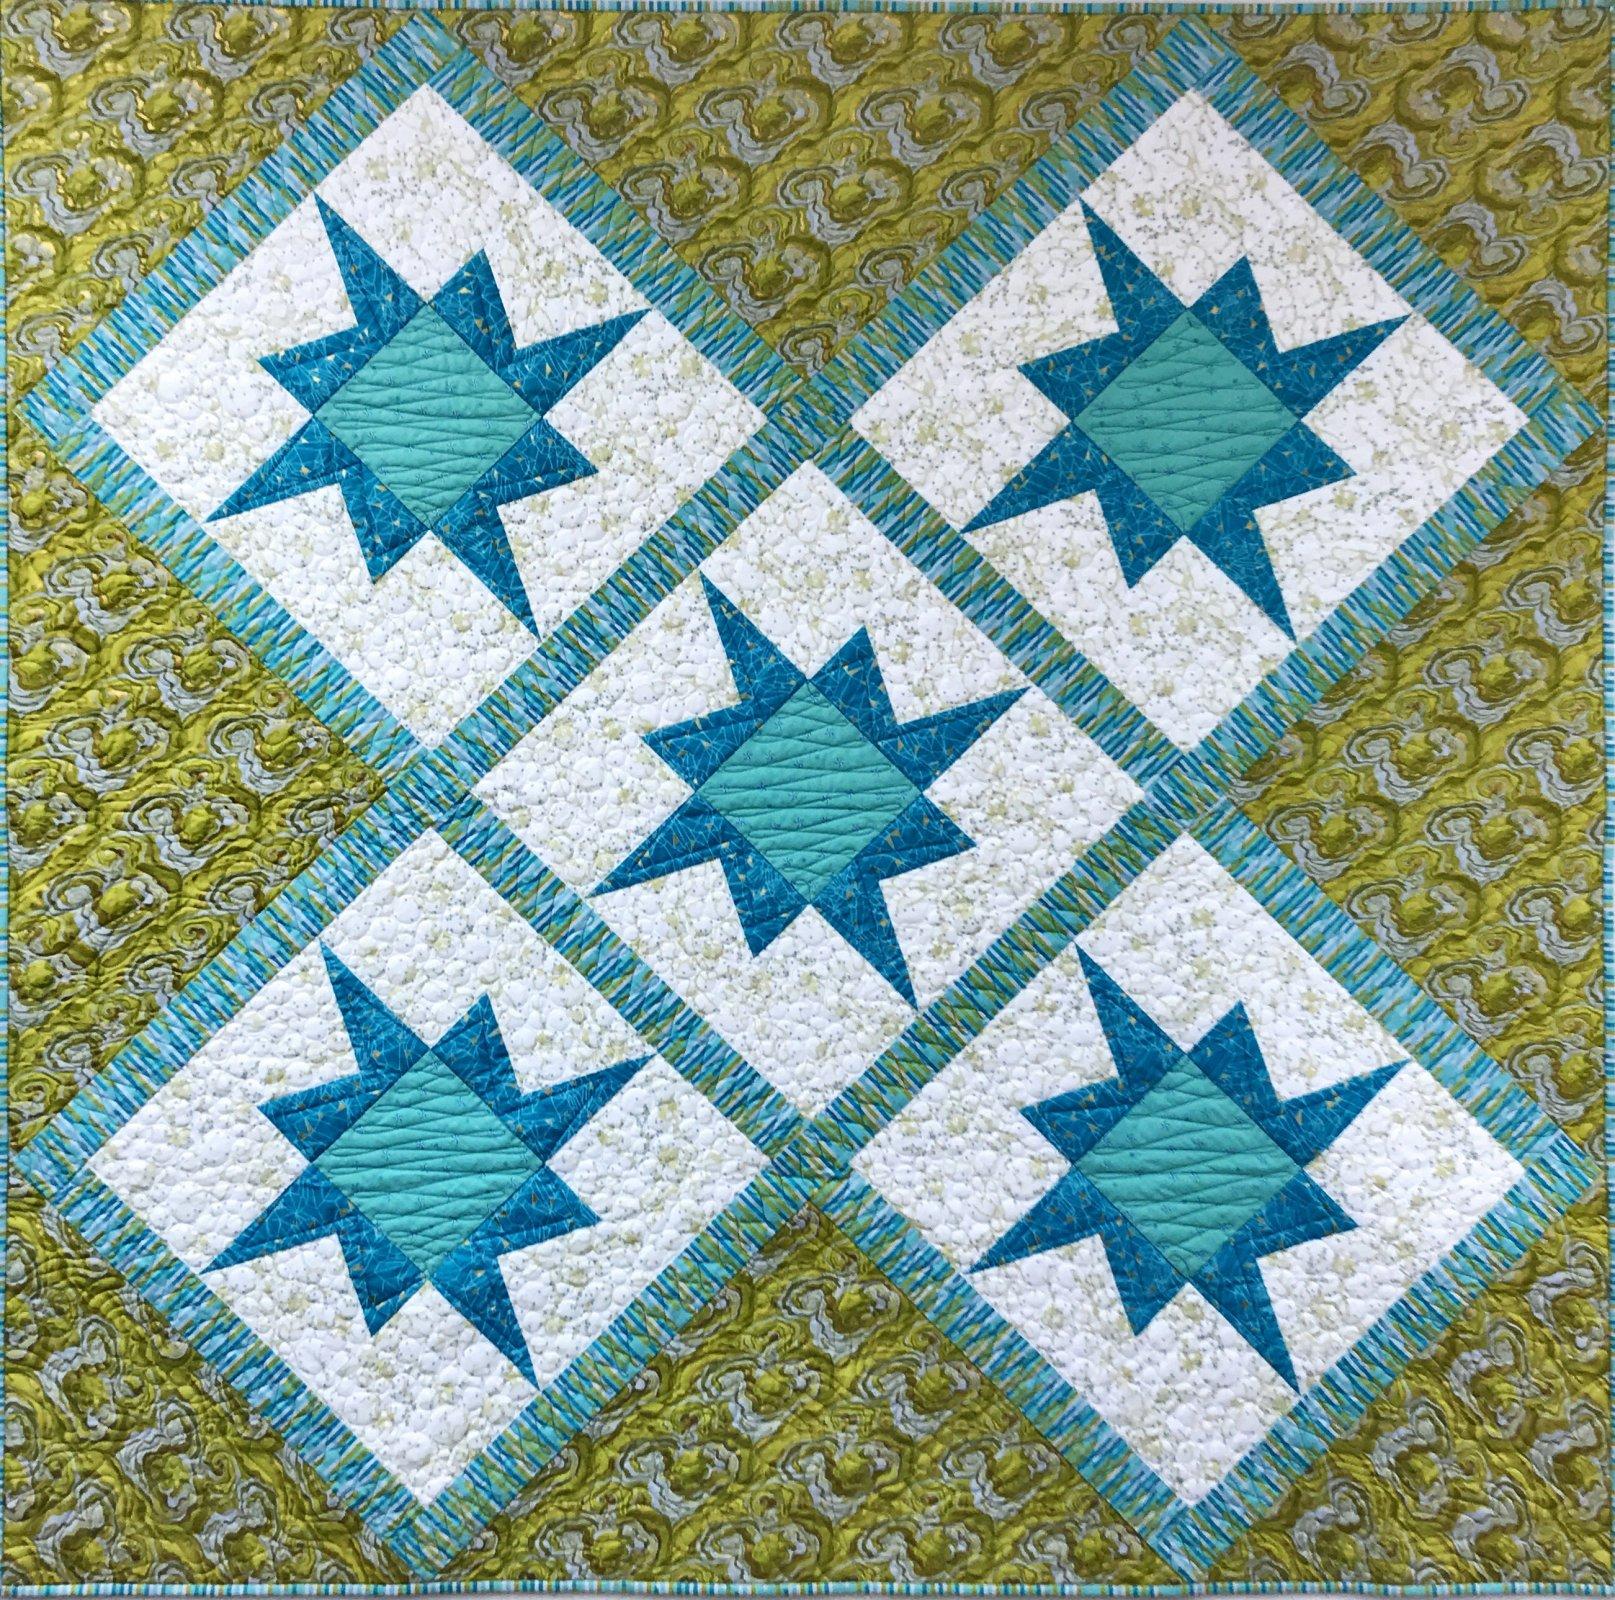 Victoria Borealis X-Block Pattern